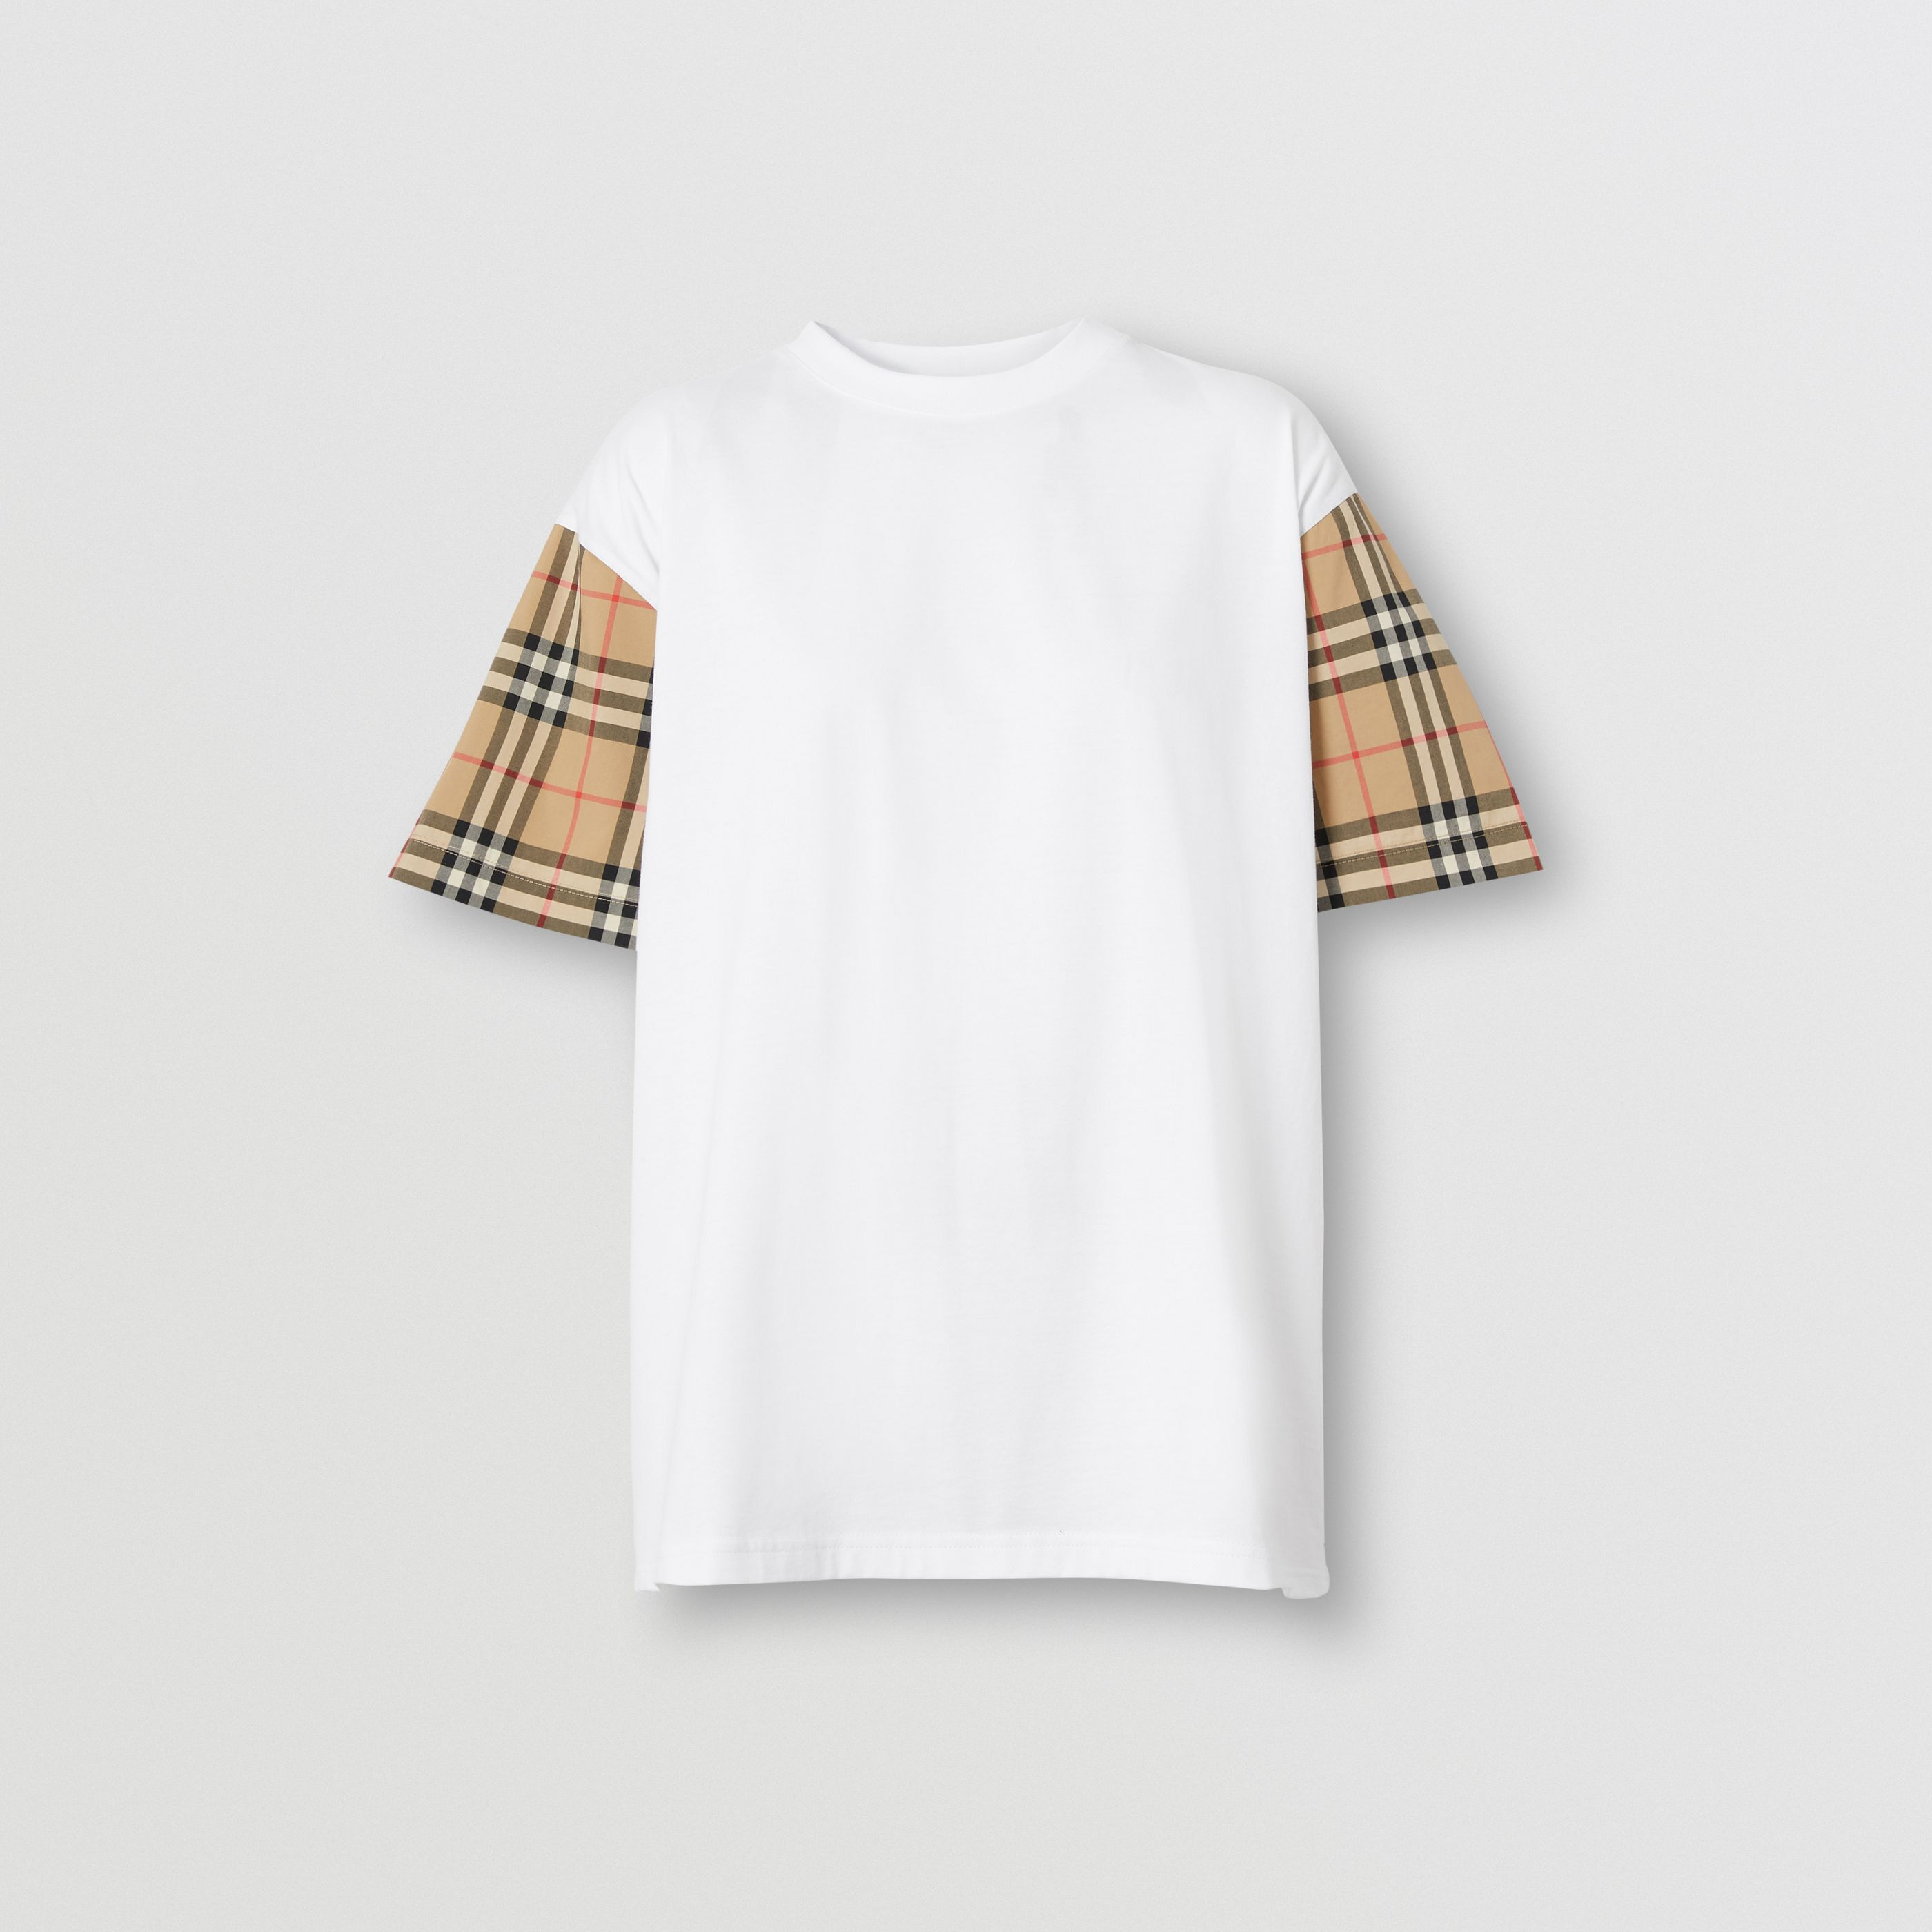 T-shirt oversize in cotone con maniche Vintage check (Bianco) - Donna   Burberry - 4